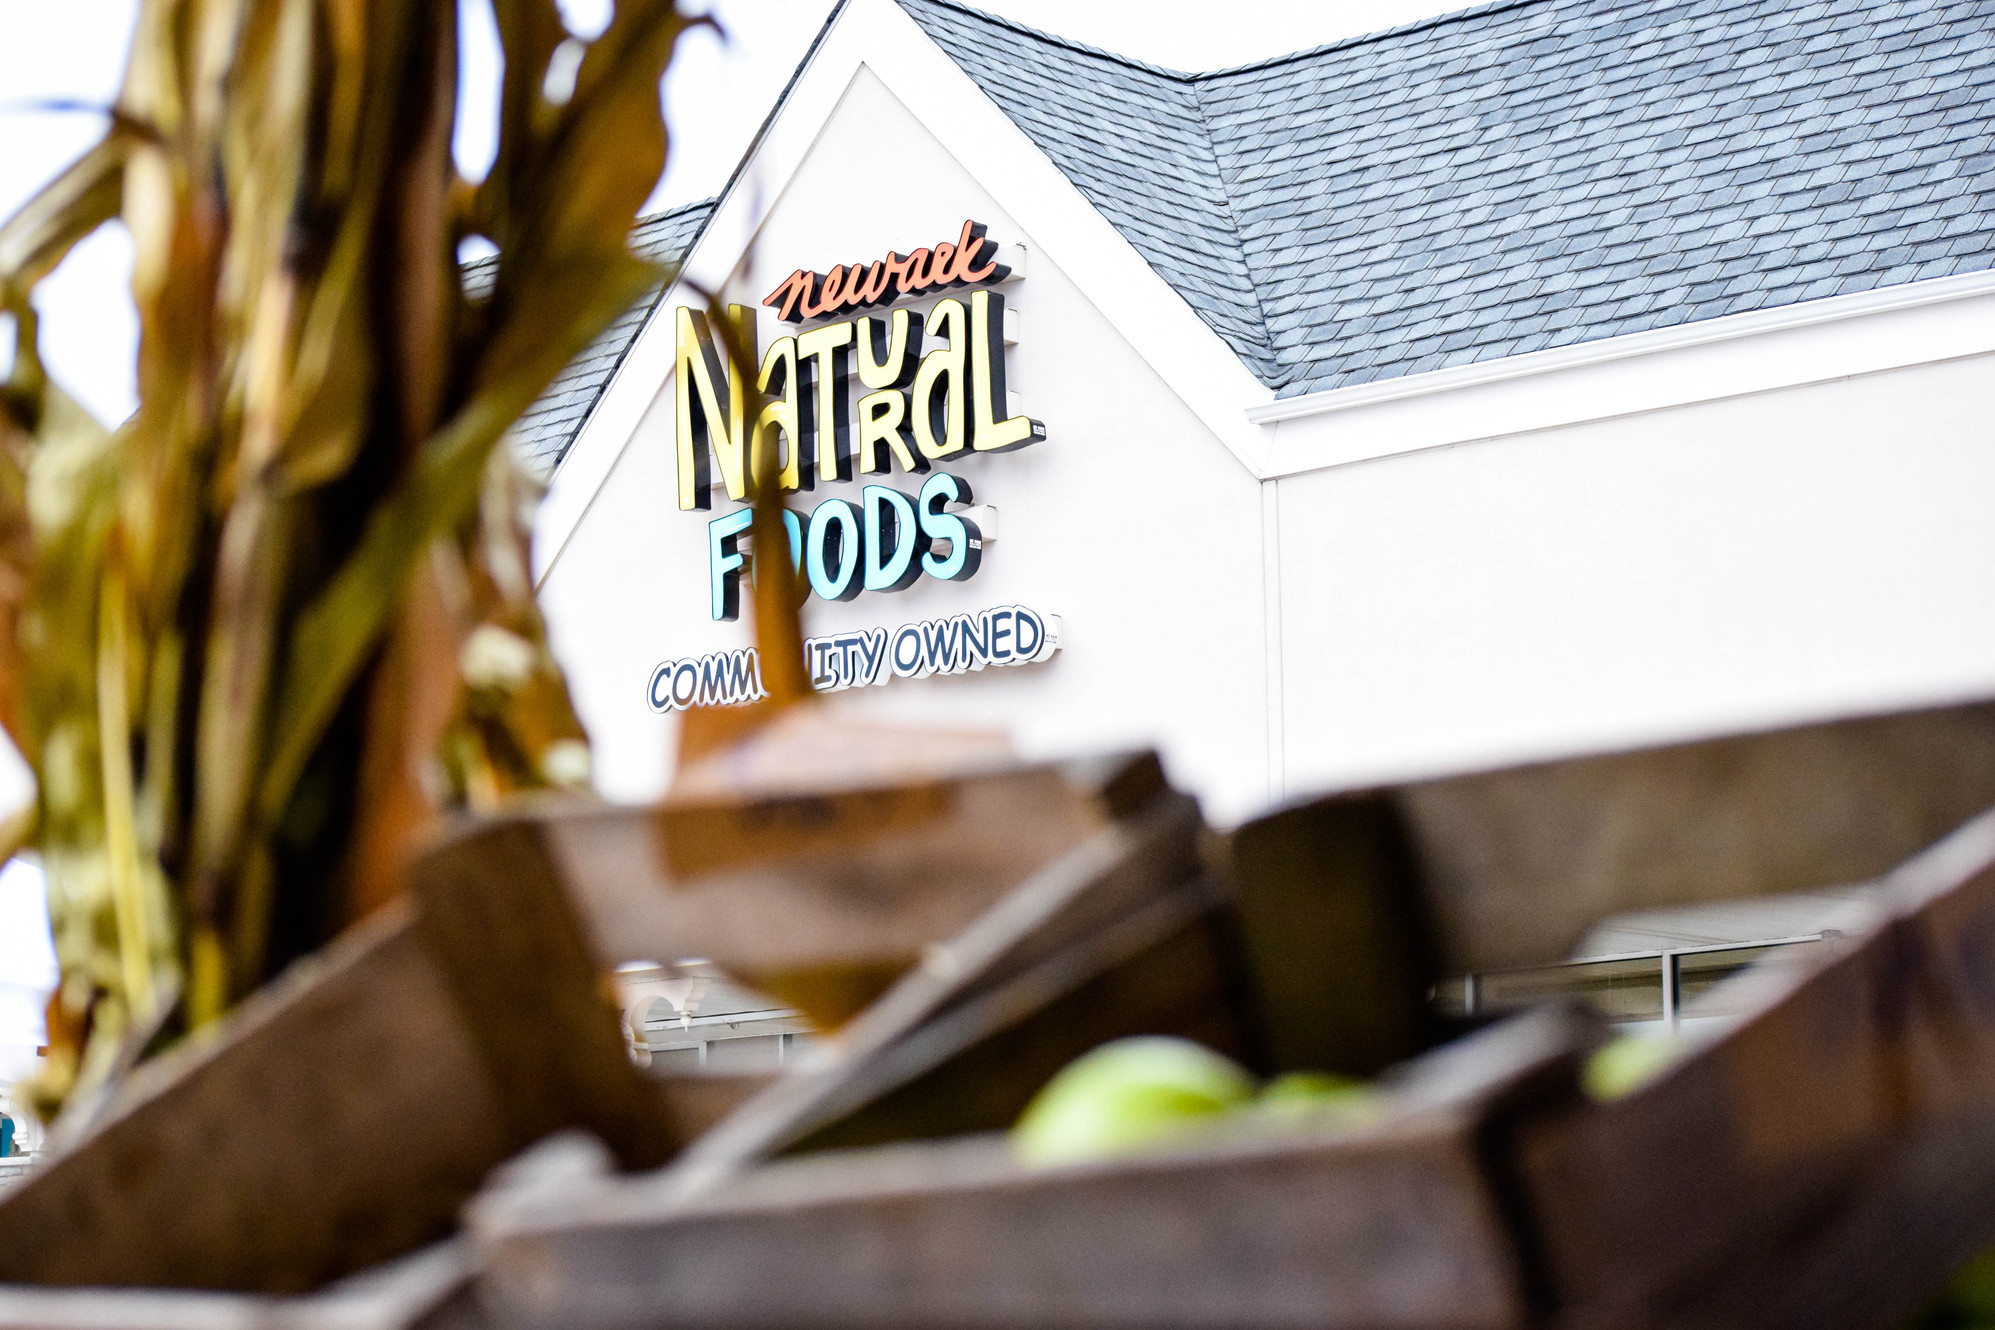 Newark Natural Foods